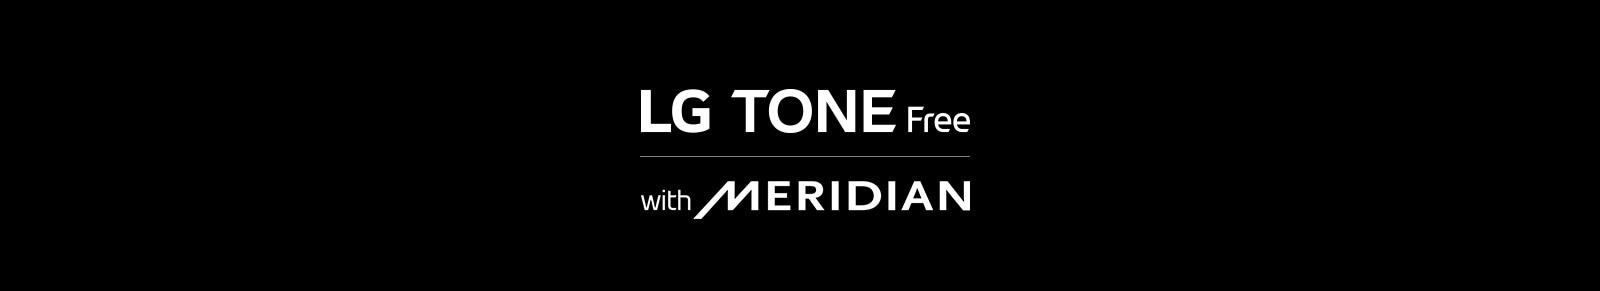 LG TONE Free(Logo), with MERIDIAN(Logo)